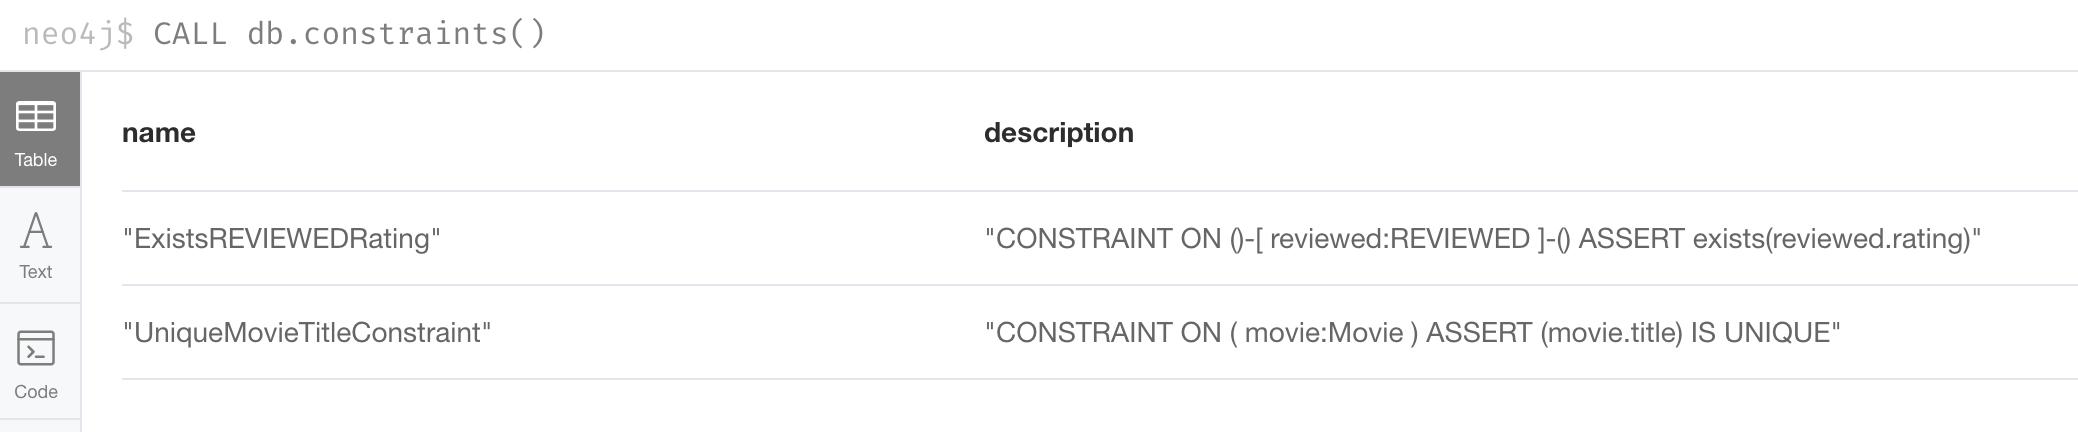 call_db_constraints